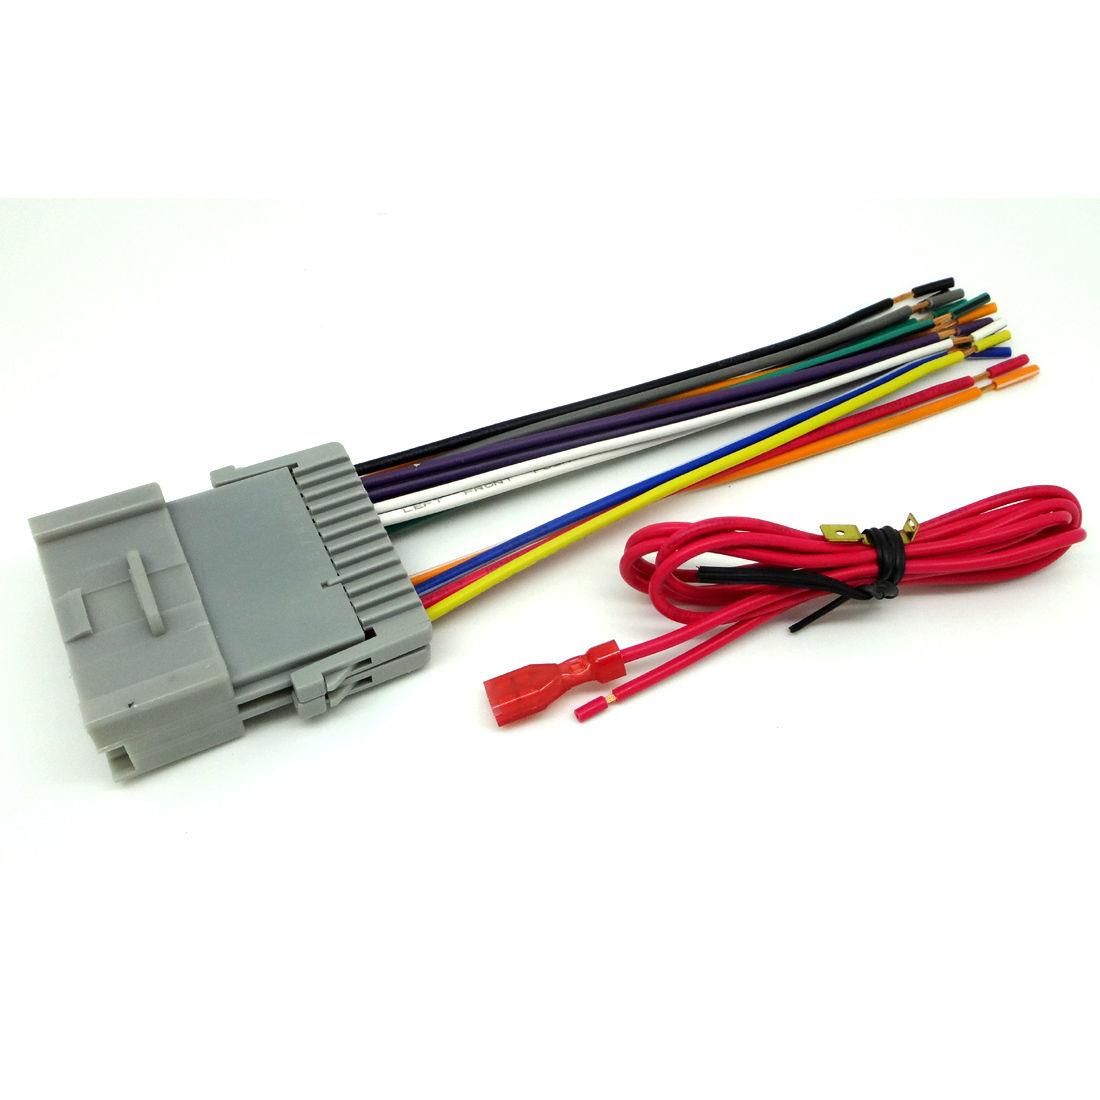 radio wiring harness adapter pontiac aztek ewiring, engine diagram, pontiac aztek stereo wiring diagram